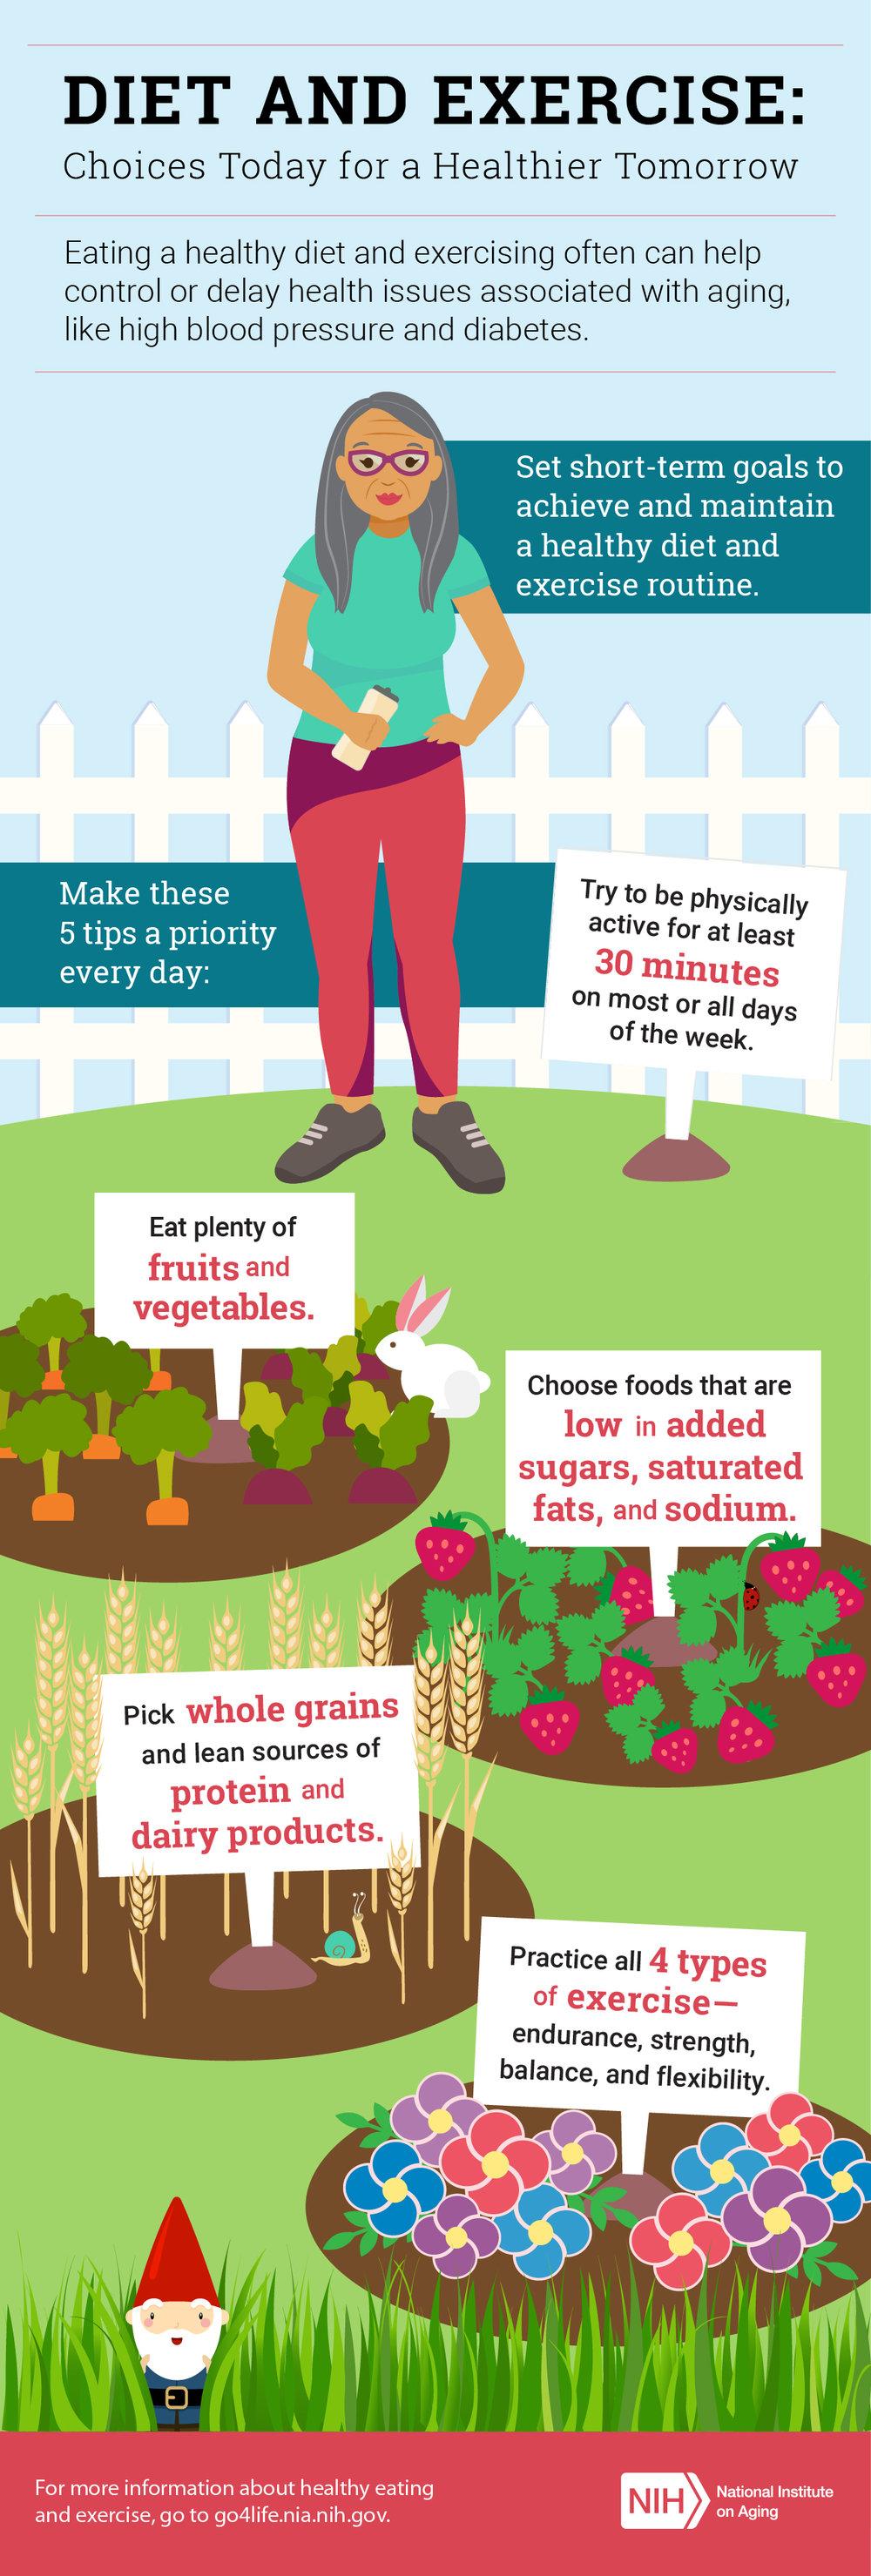 nia_dietandexercise_infographic_0.jpg